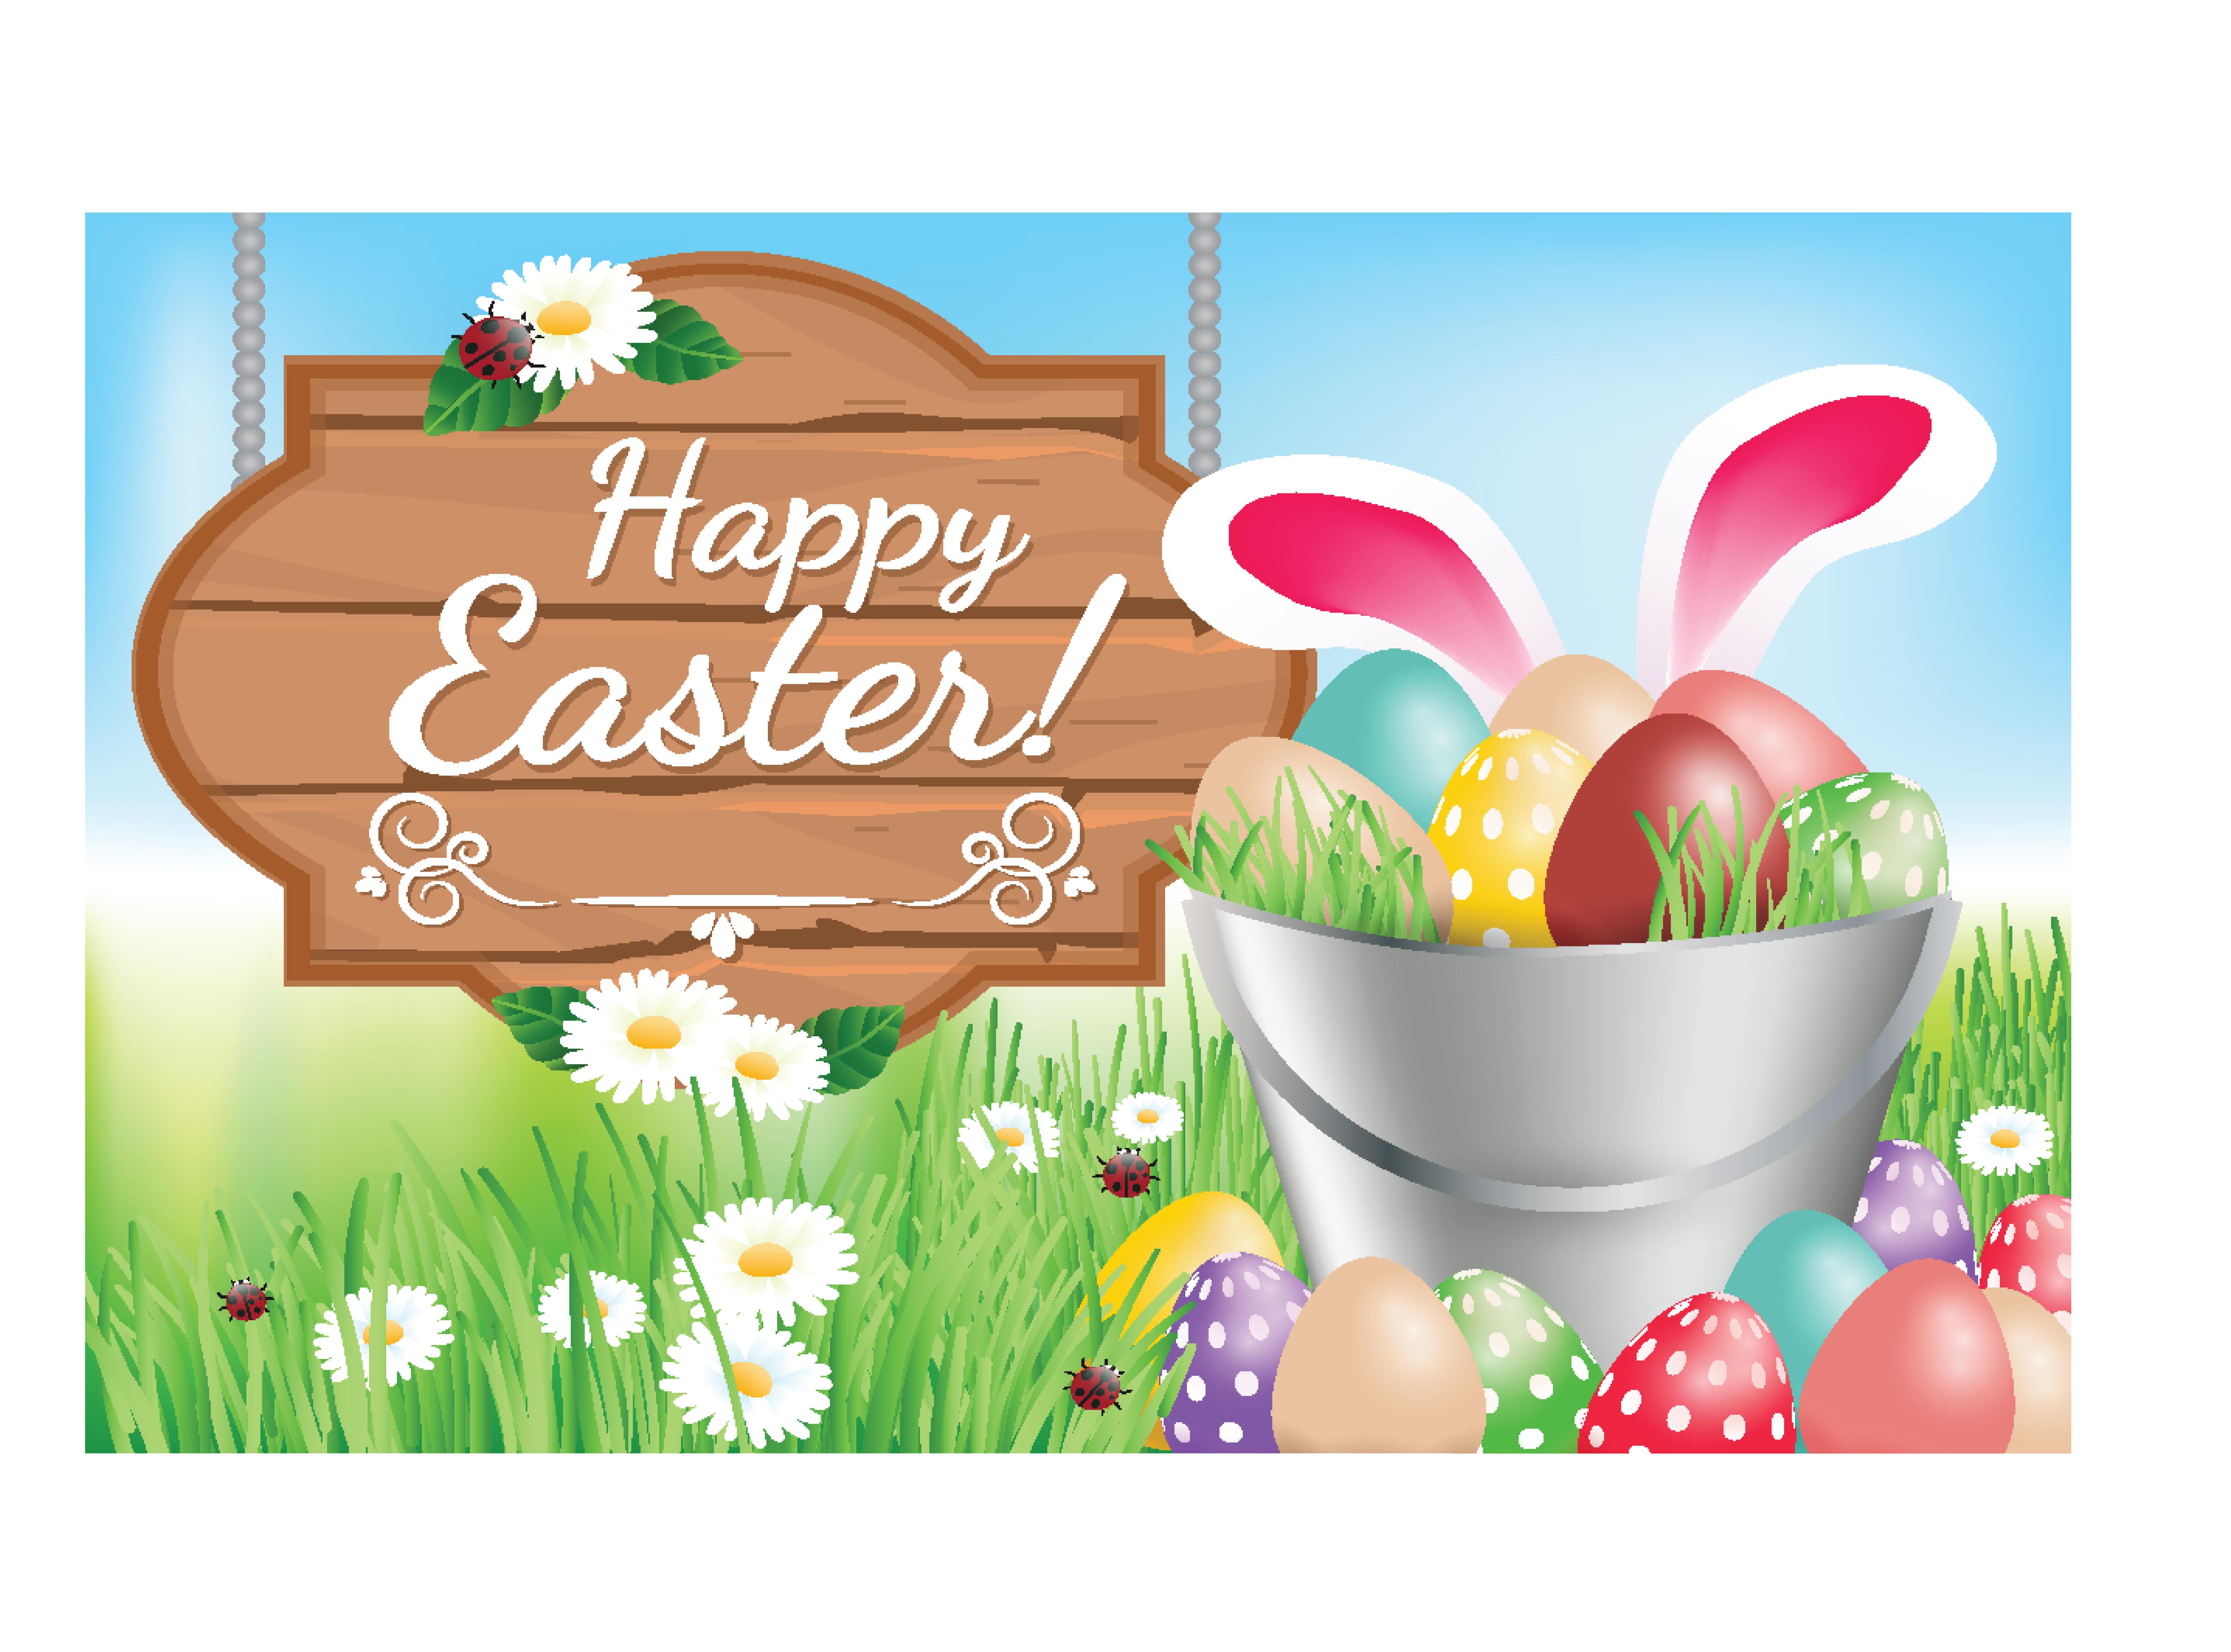 Easter greetings from the oc tribune orange county tribune easter greetings from the oc tribune kristyandbryce Images